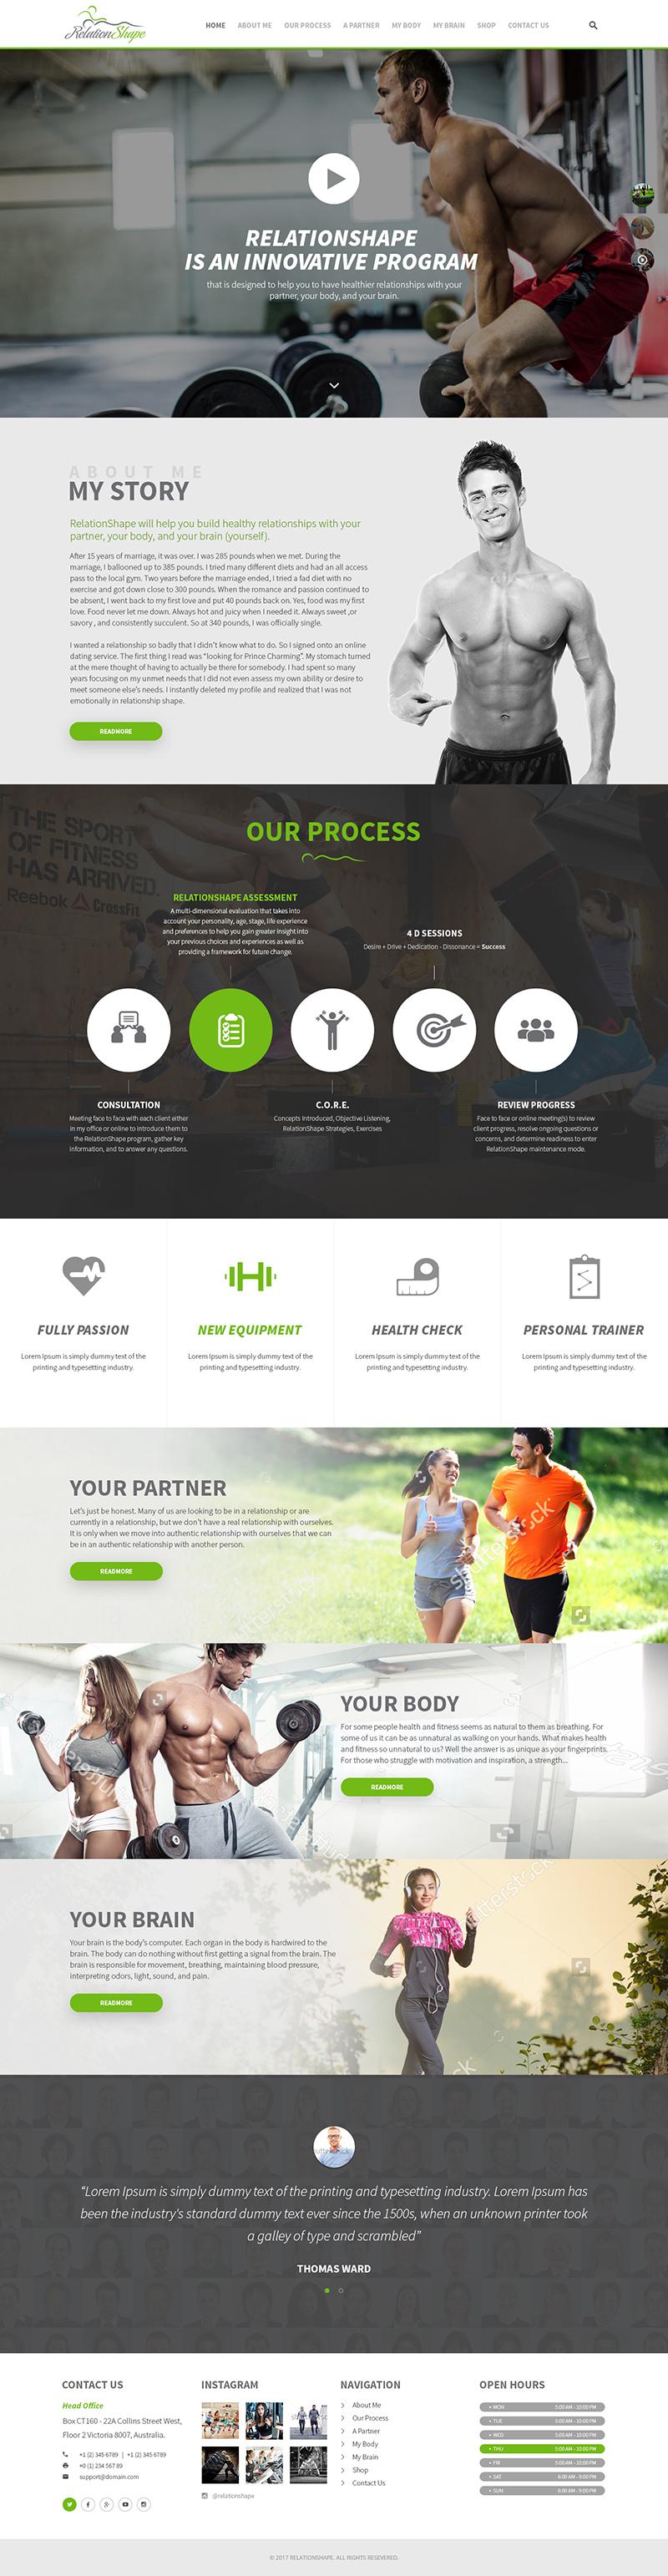 Custom Website Design for Relation Shape - Logo Design Deck